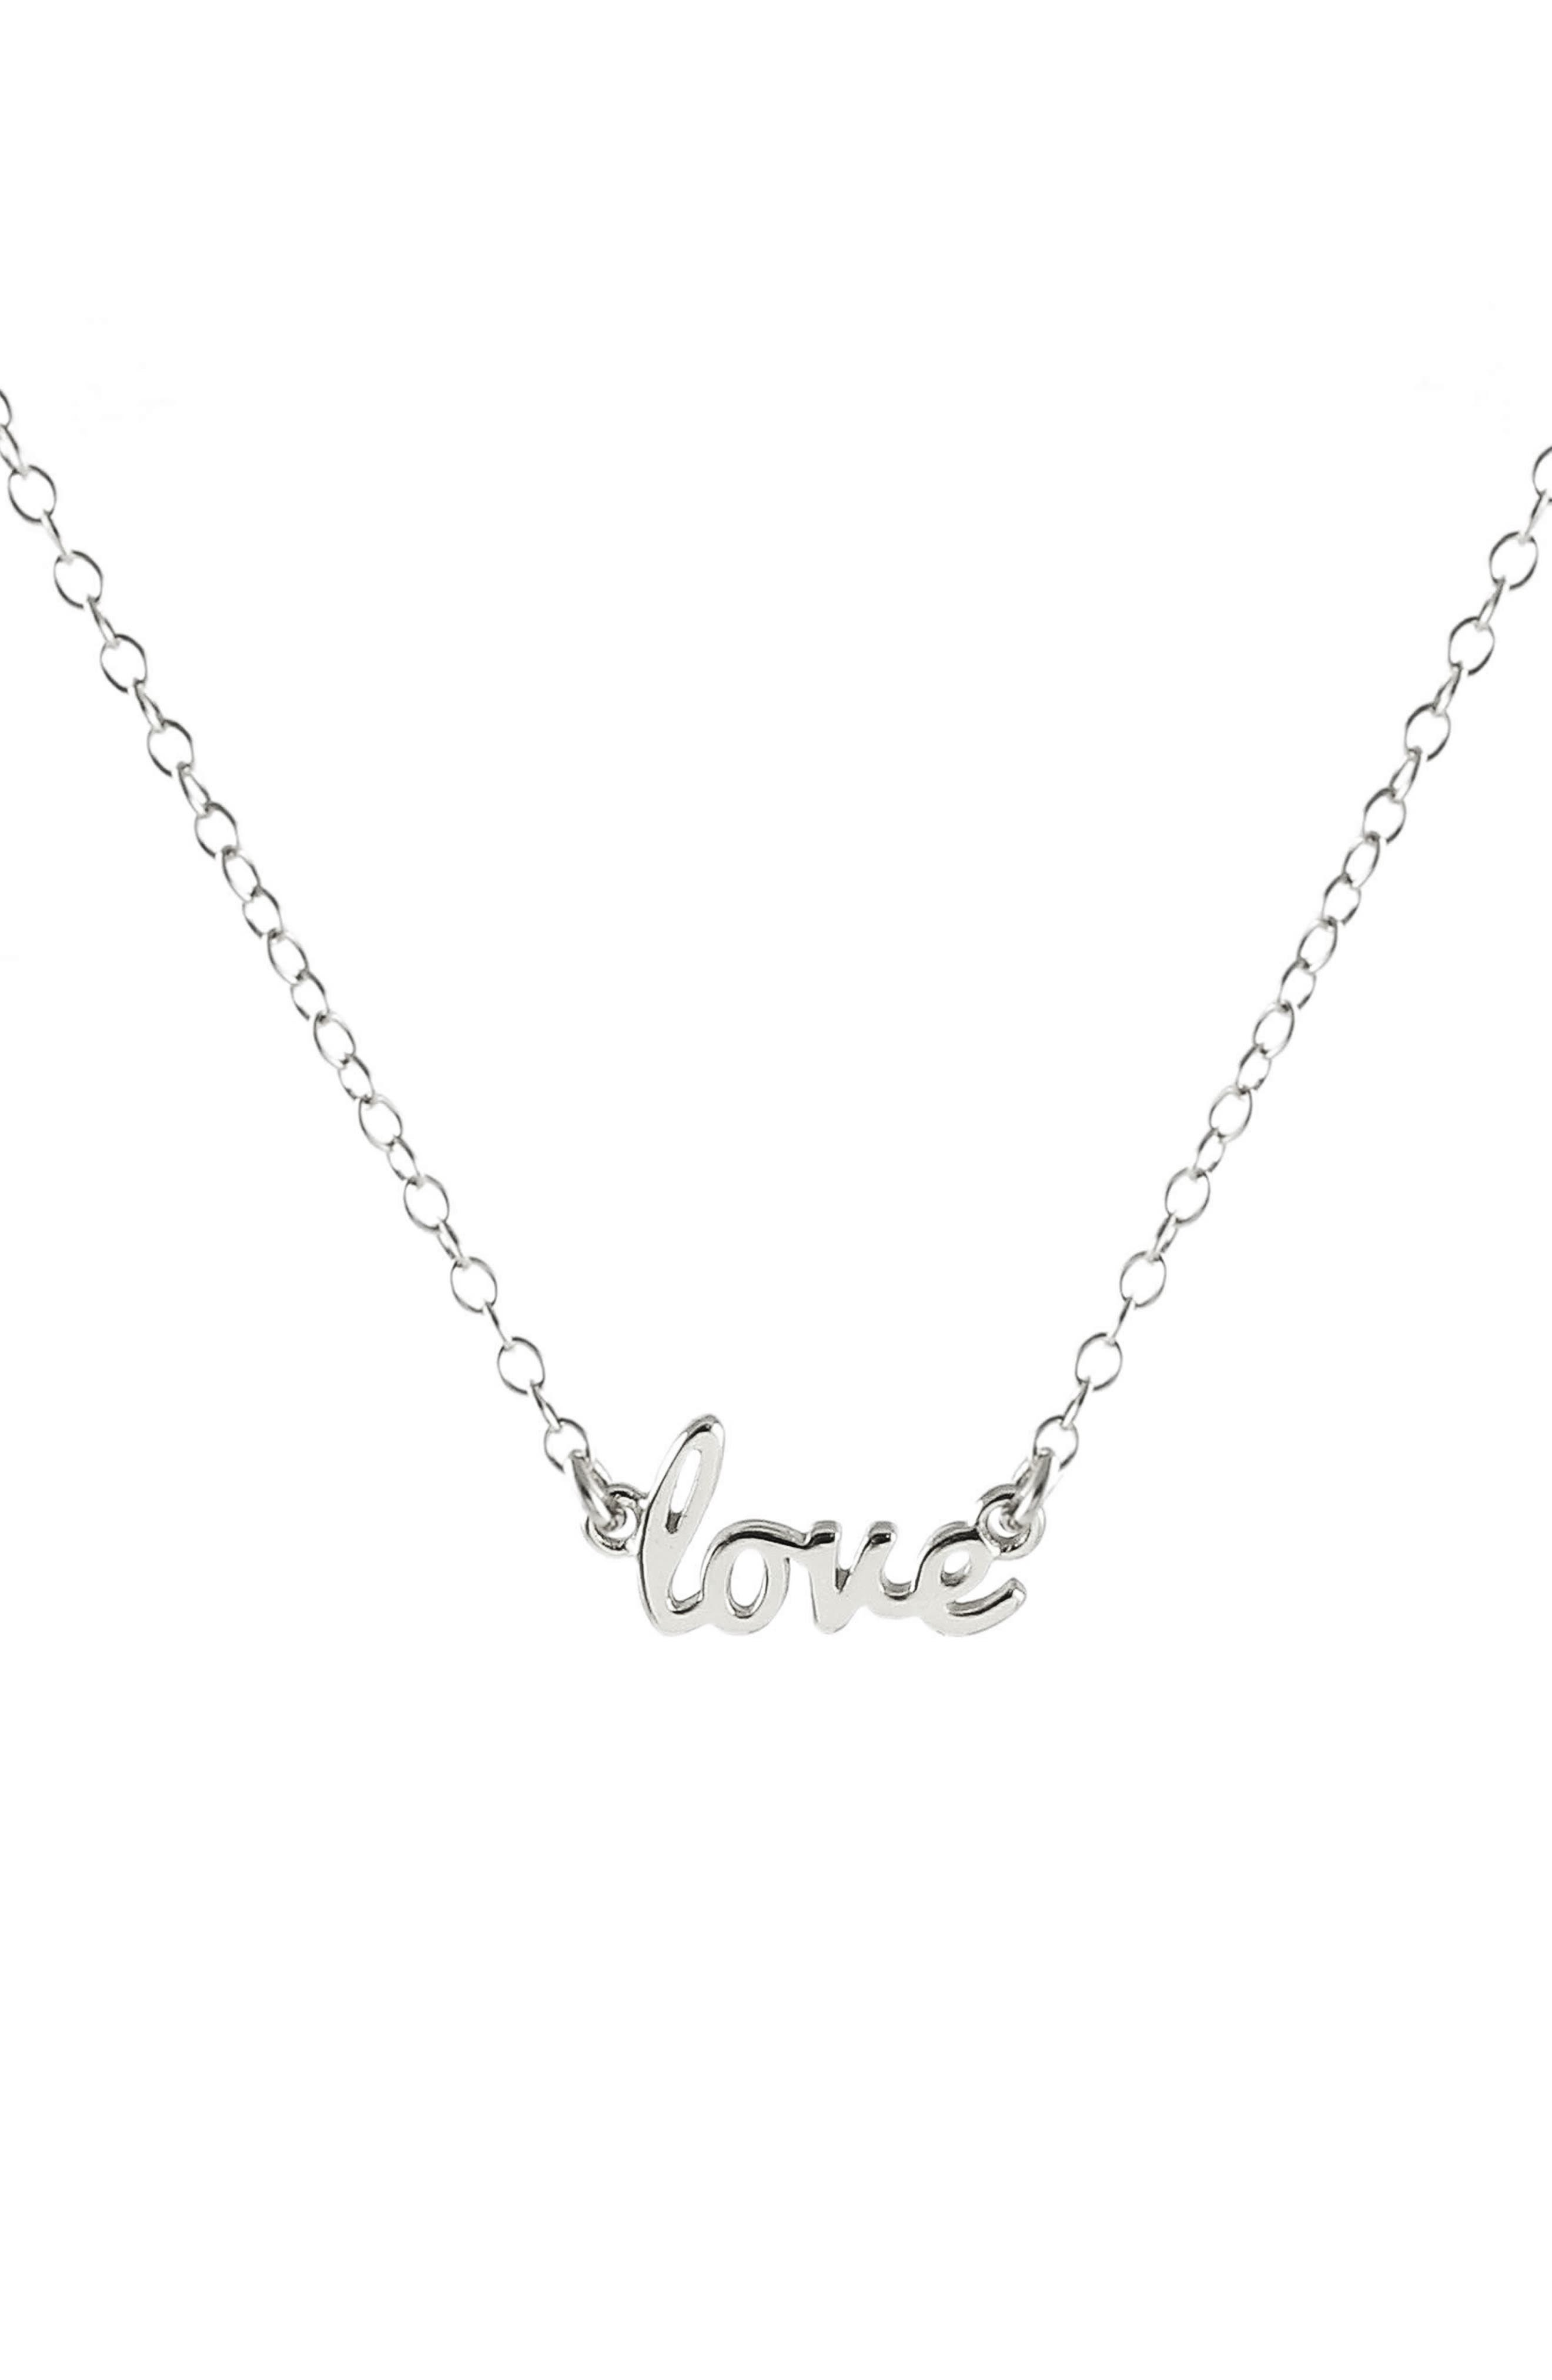 Love Script Necklace,                         Main,                         color, Silver